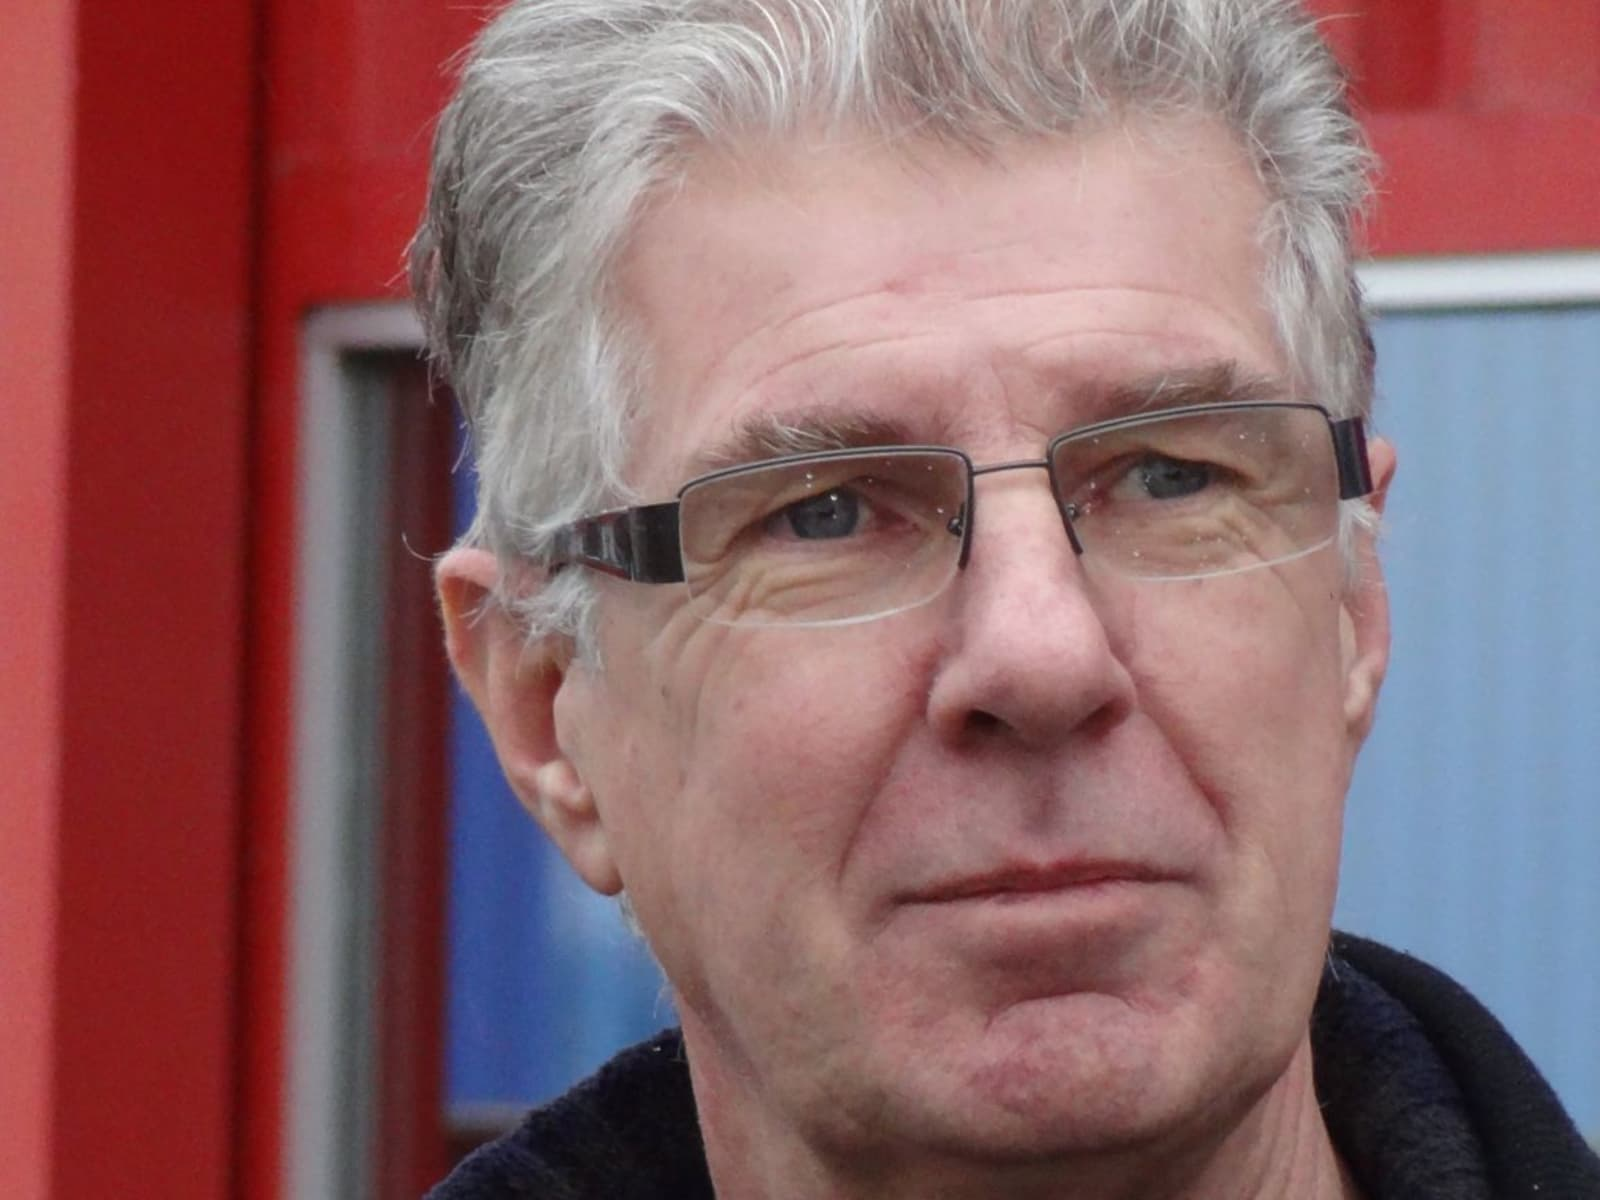 Derek from Holywell, United Kingdom